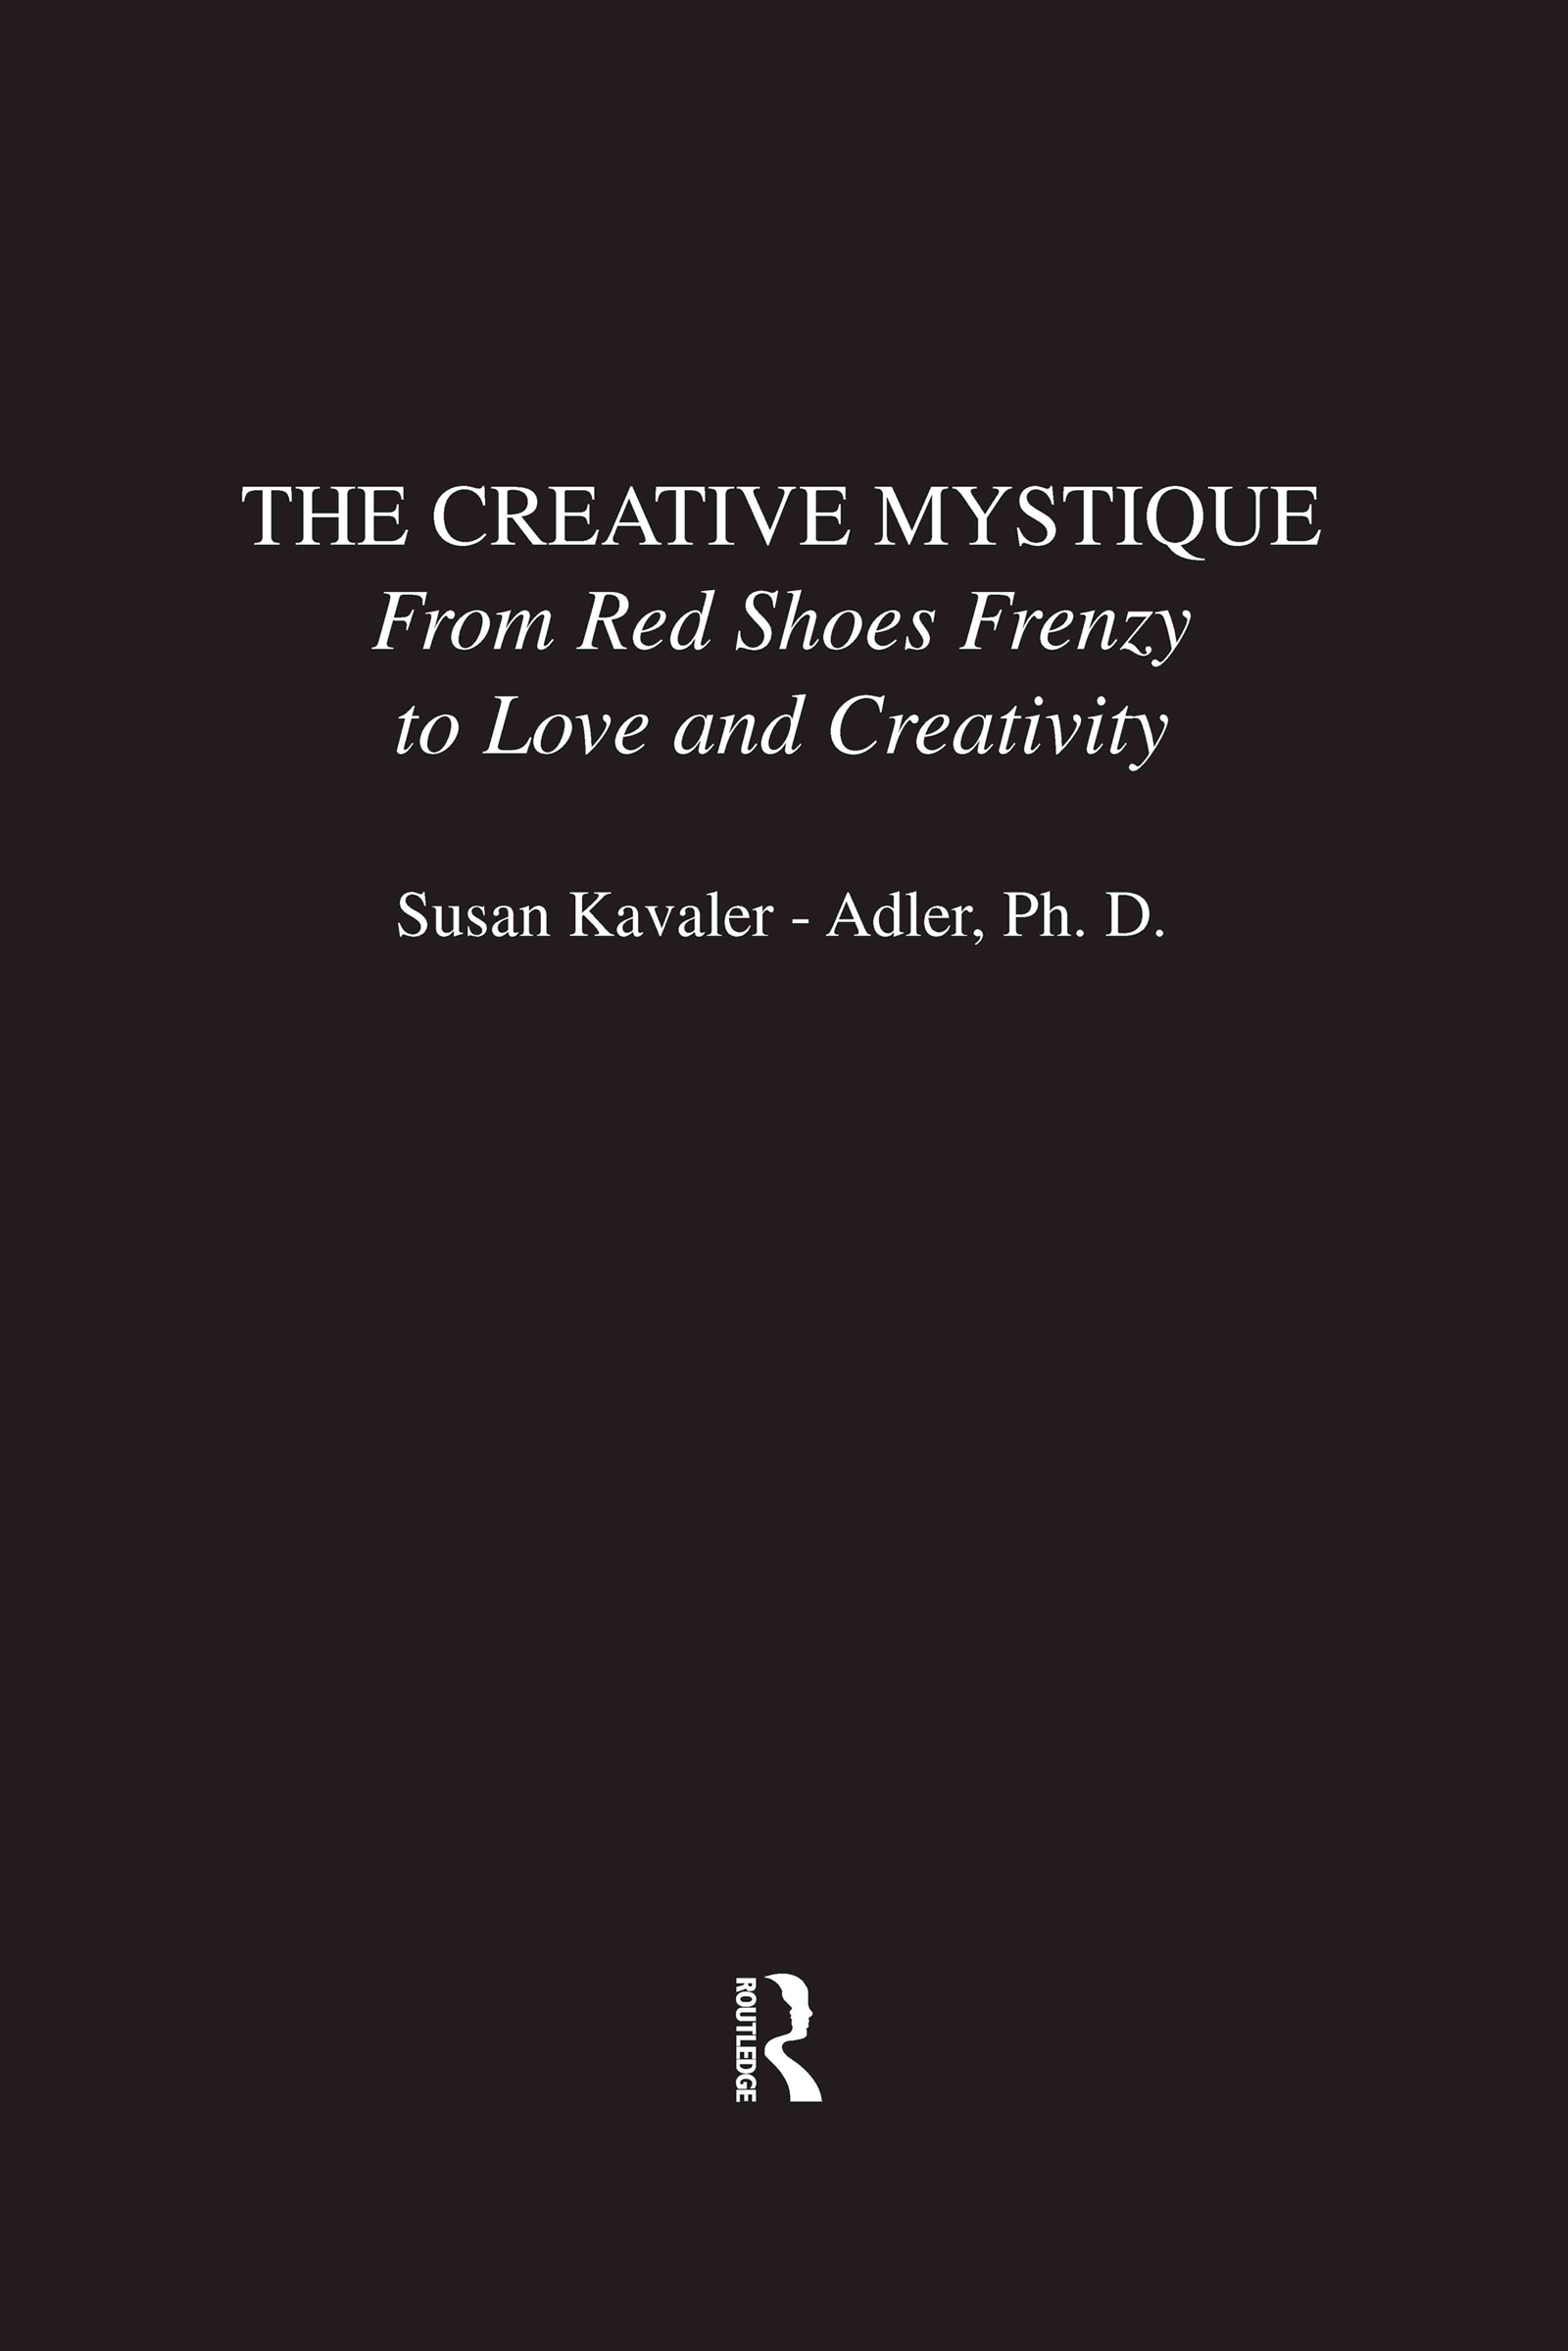 The Creative Mystique